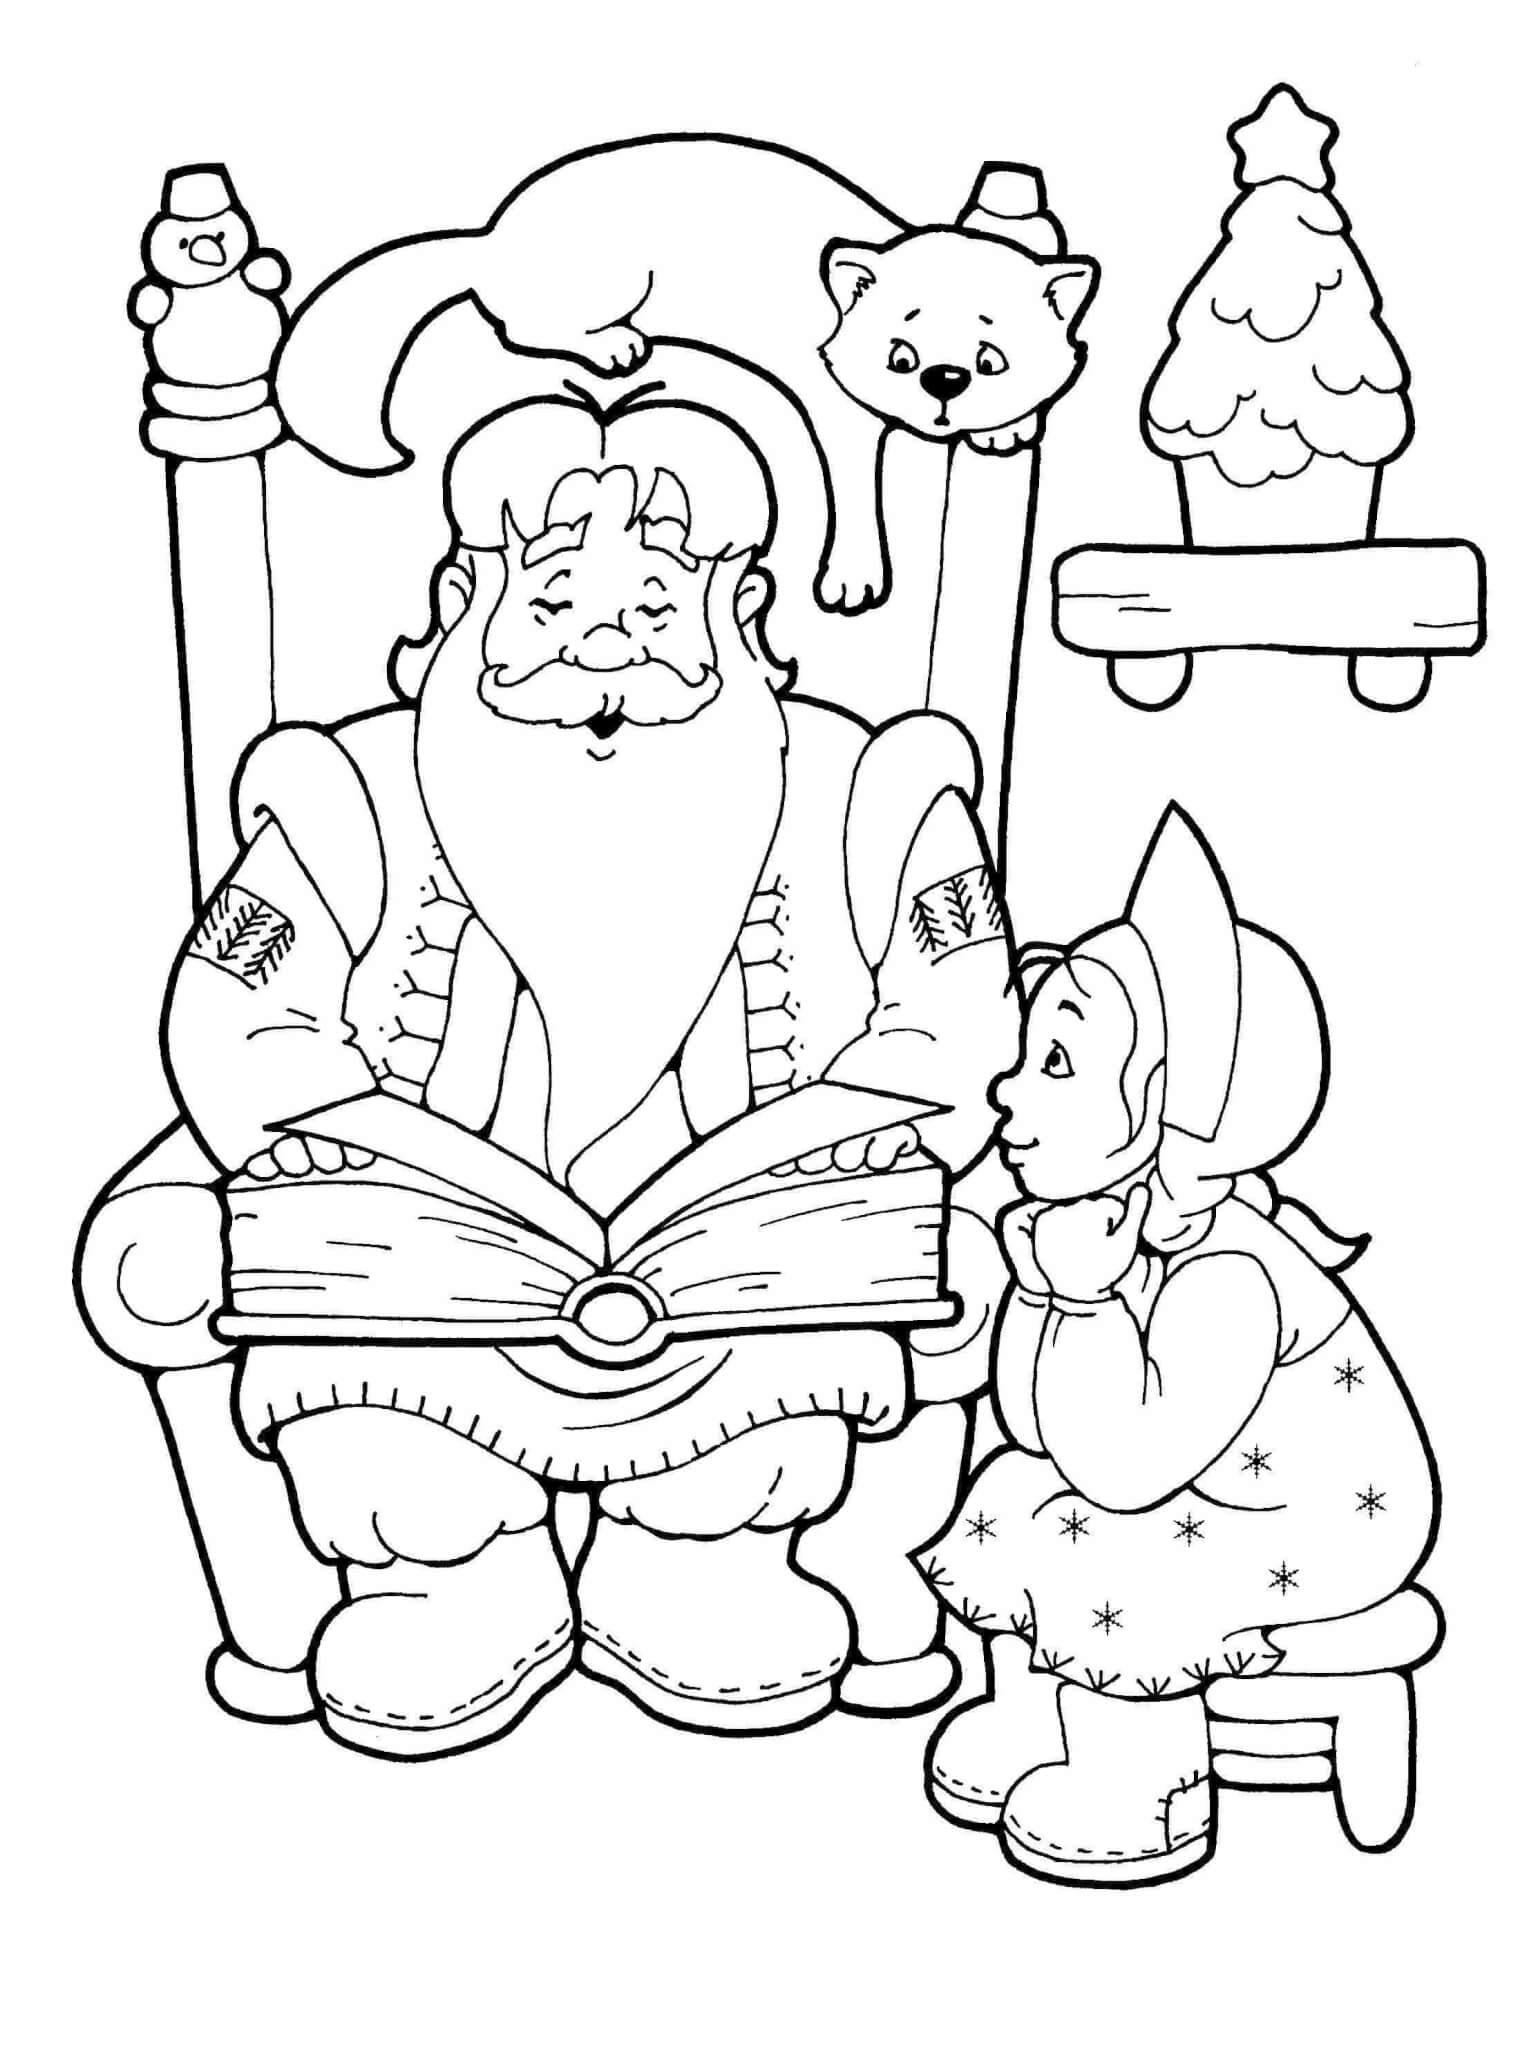 Снегурочка и дед мороз картинки раскраски, муар открытка